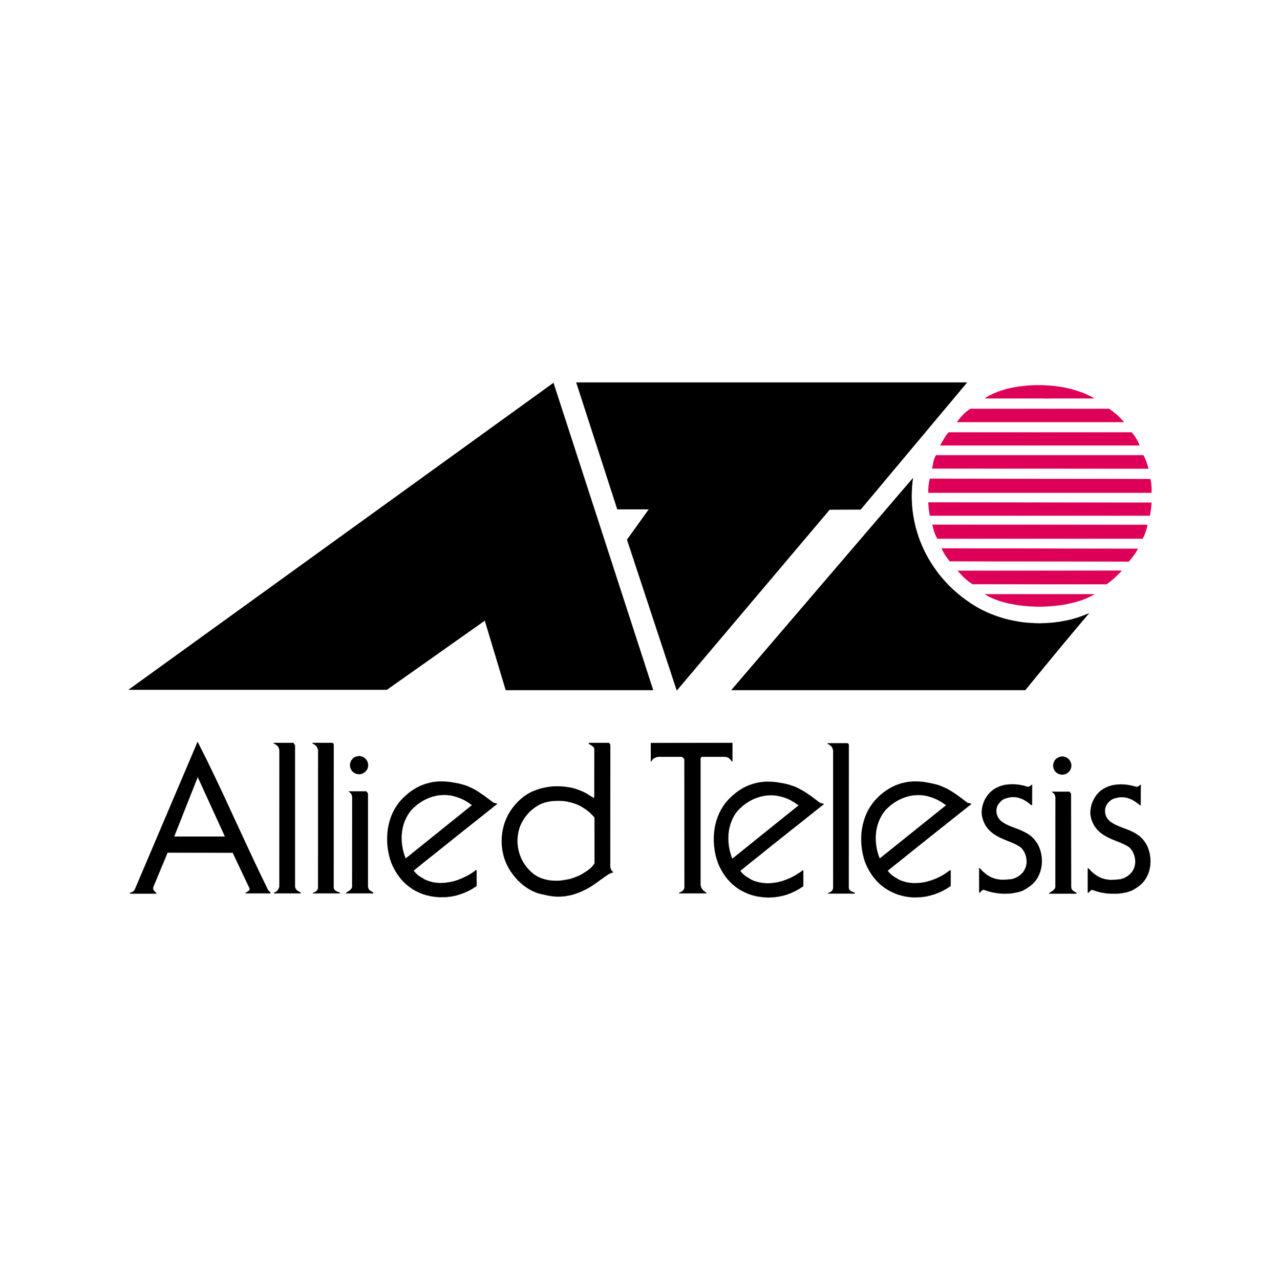 https://www.fortissecurity.com.au/wp-content/uploads/2021/04/allied-telesis-1280x1280.jpg